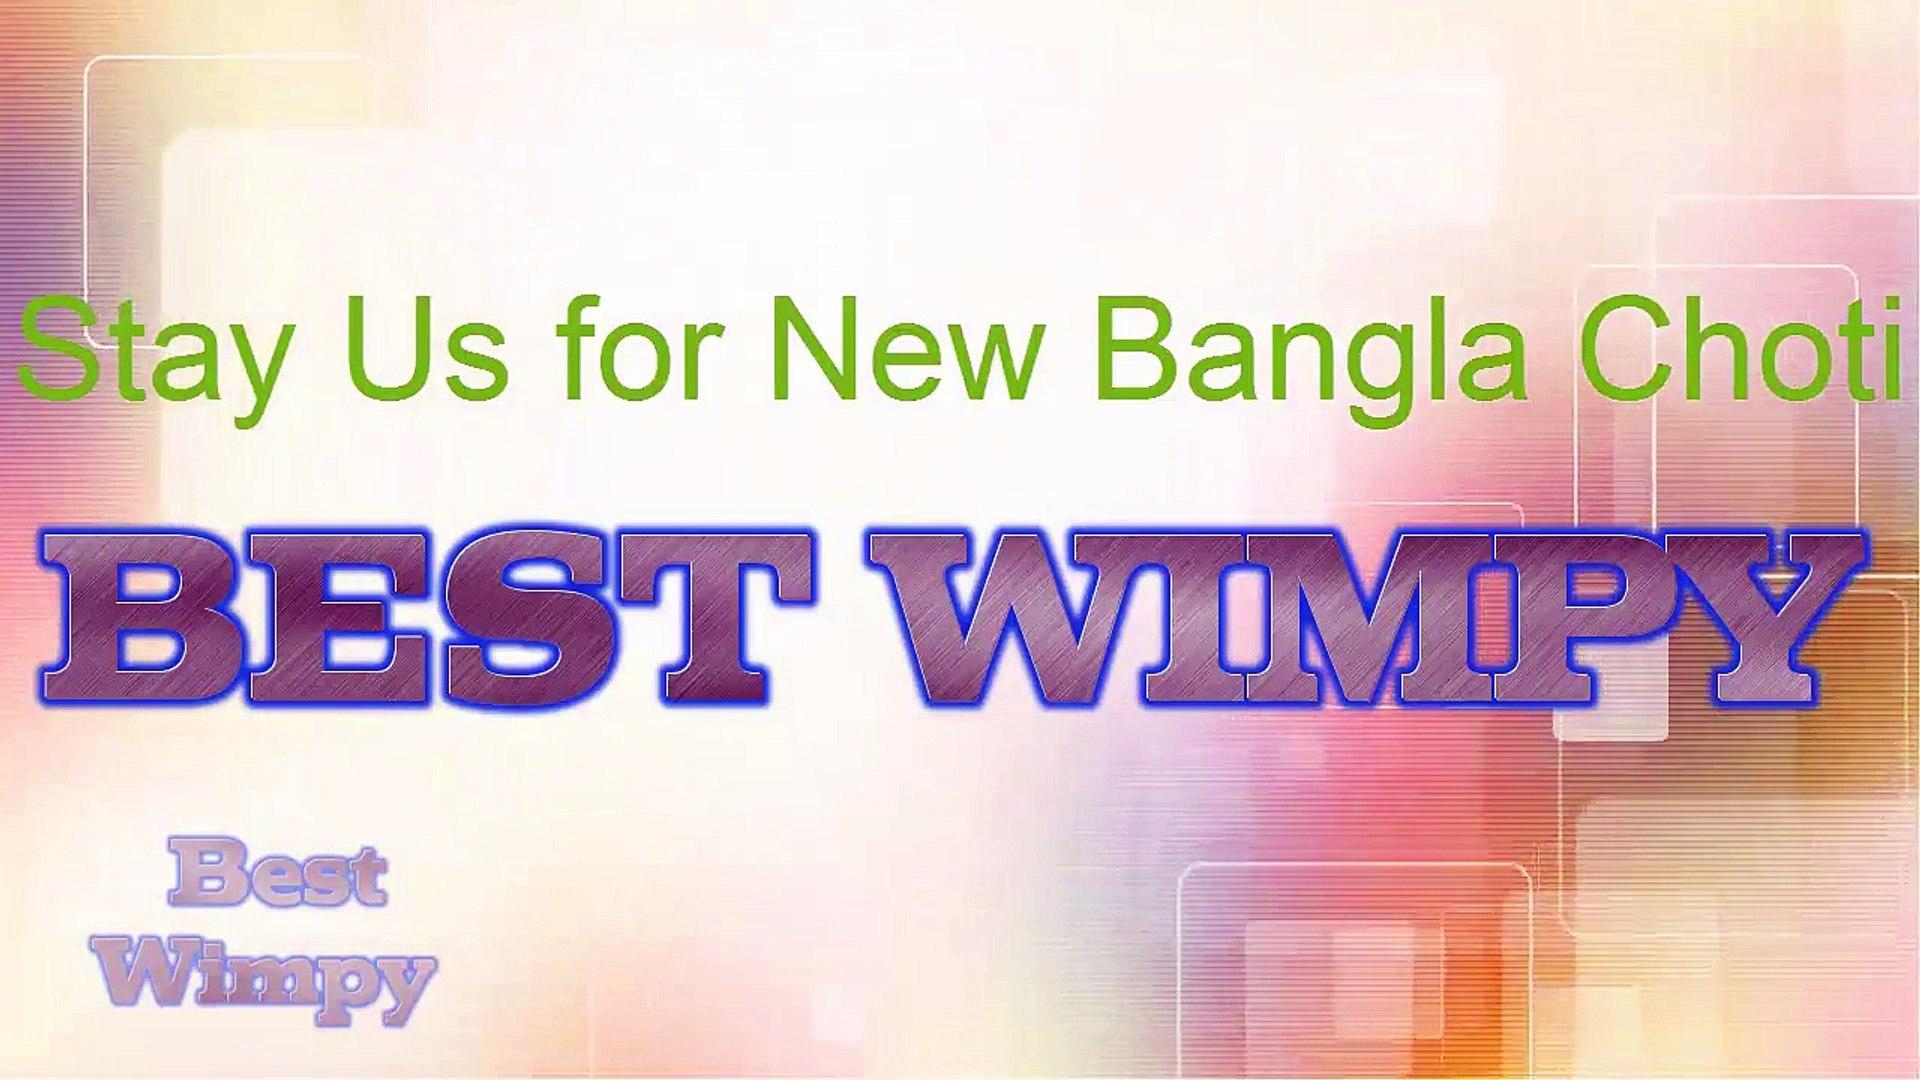 Bangla Choti বড় ভাইয়া আমাকে অনেক আদর করে | female voice choti